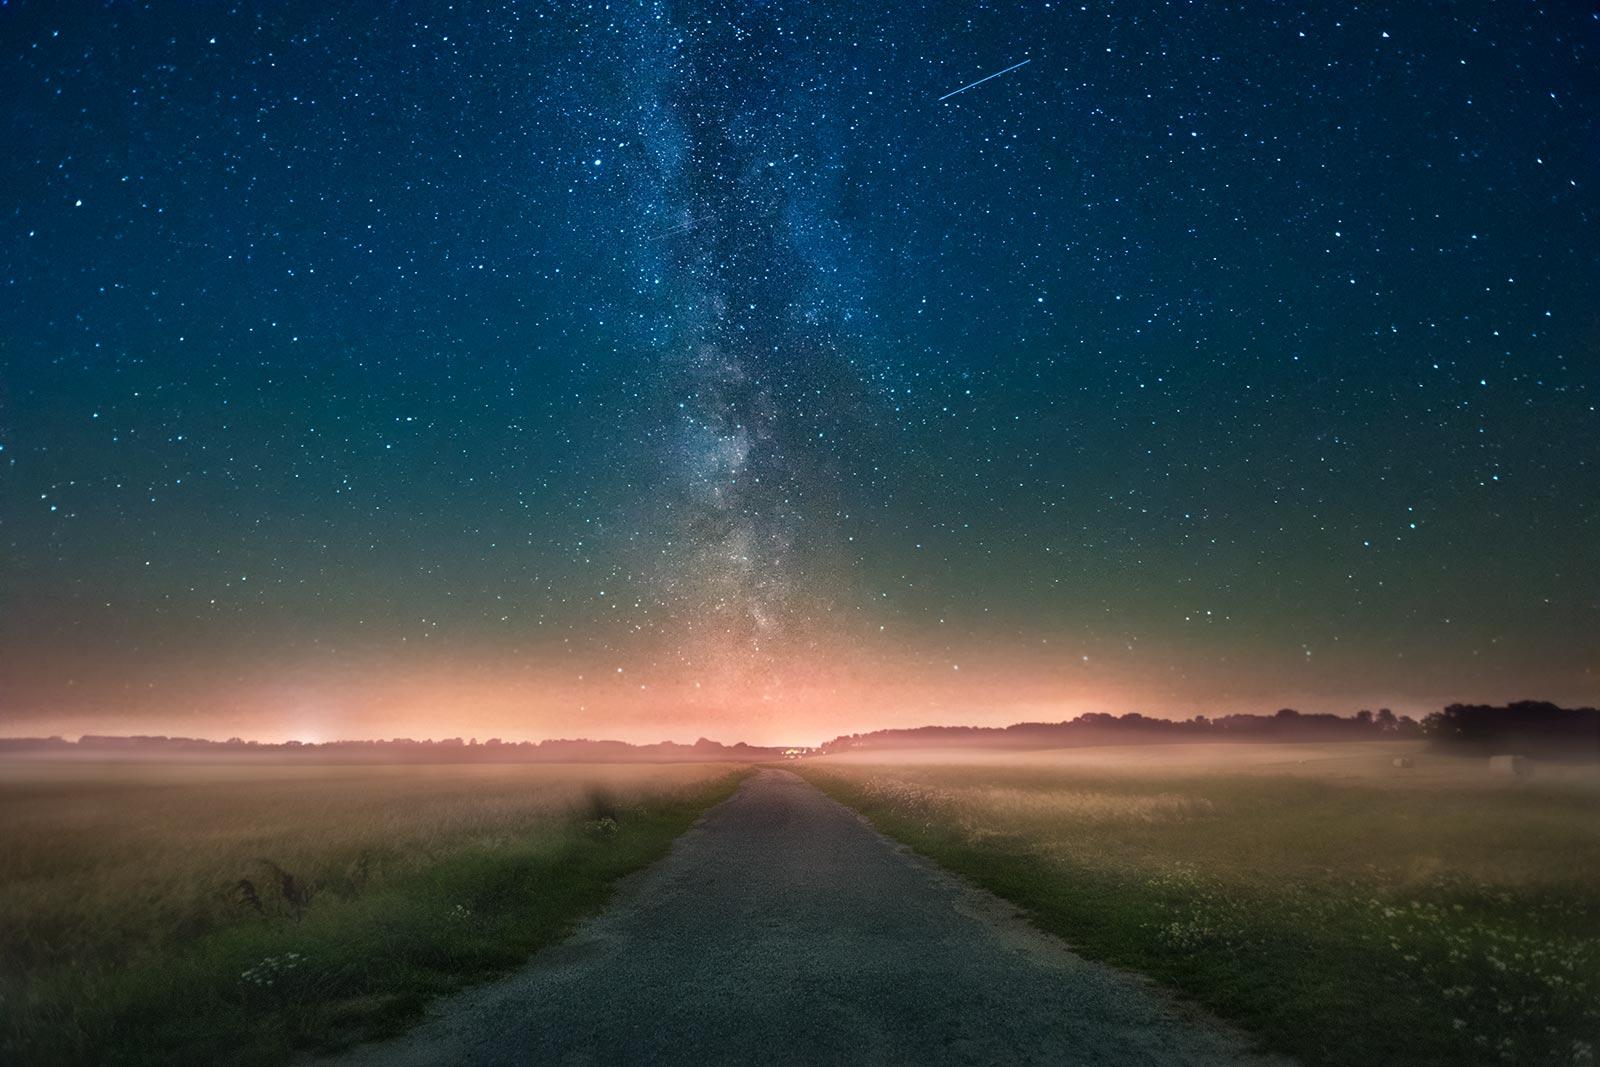 Milchstraße über Feld